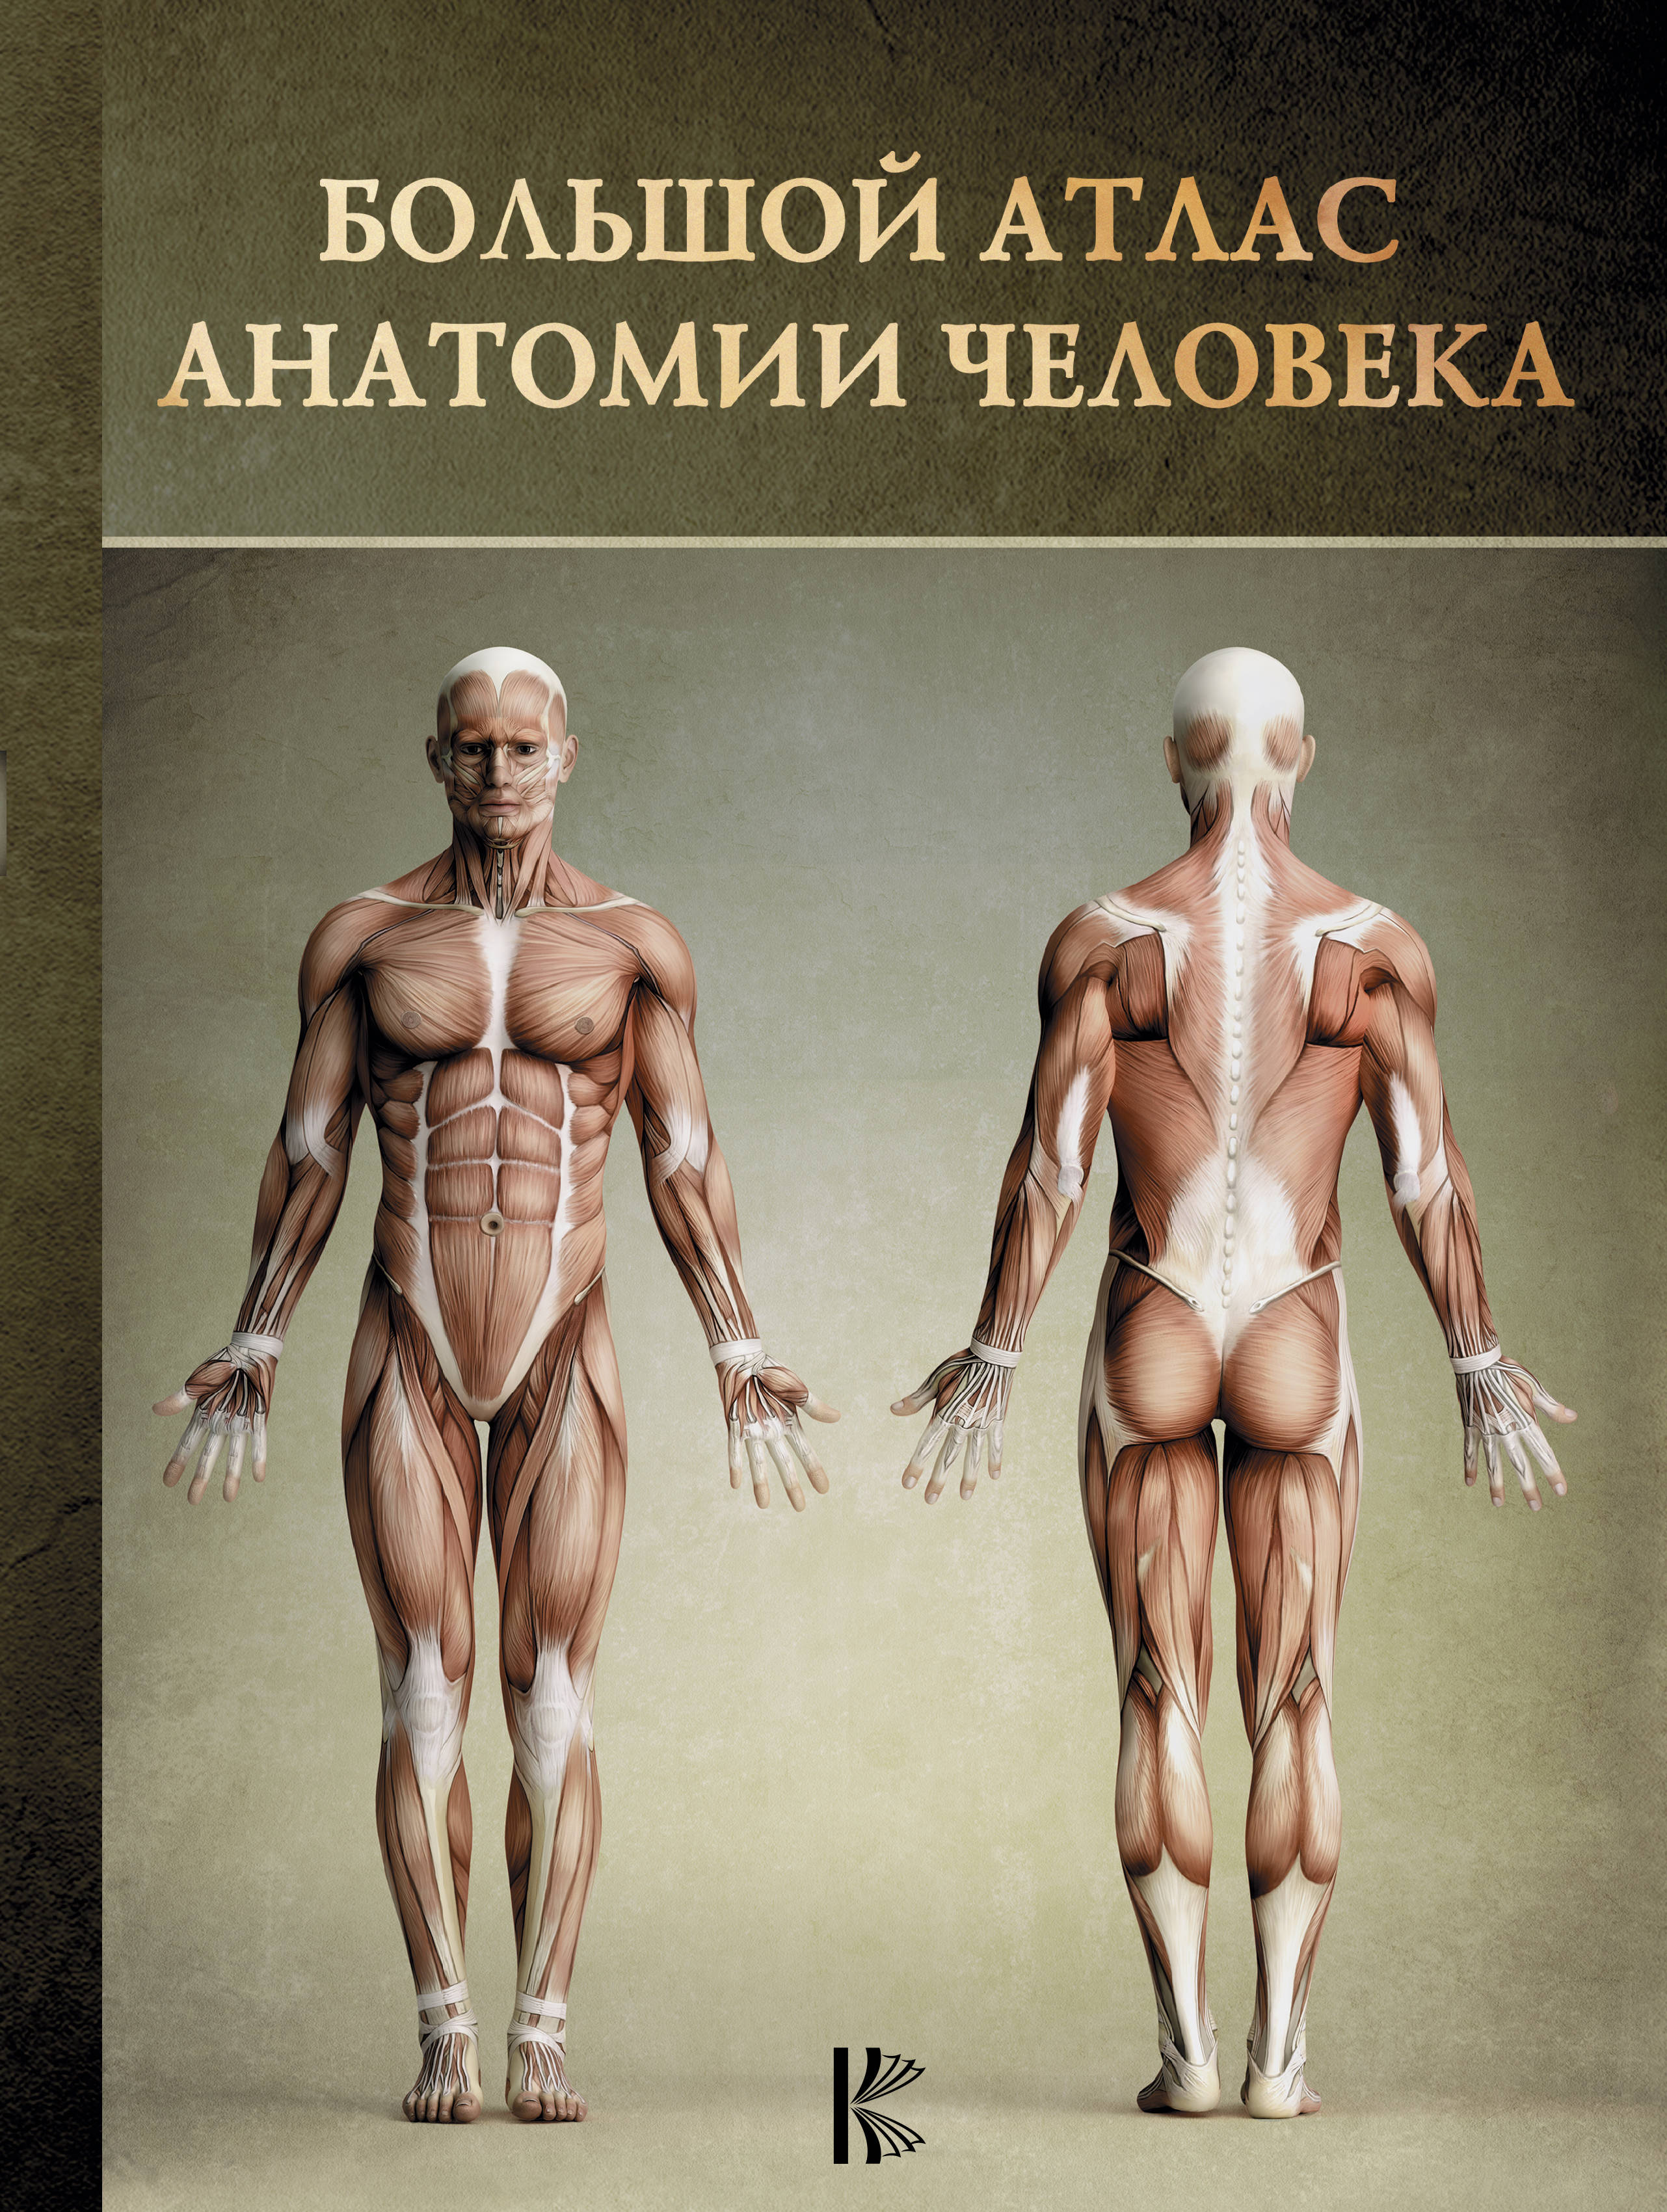 . Большой атлас анатомии человека ISBN: 978-5-17-082979-8 анатомия человека русско латинский атлас